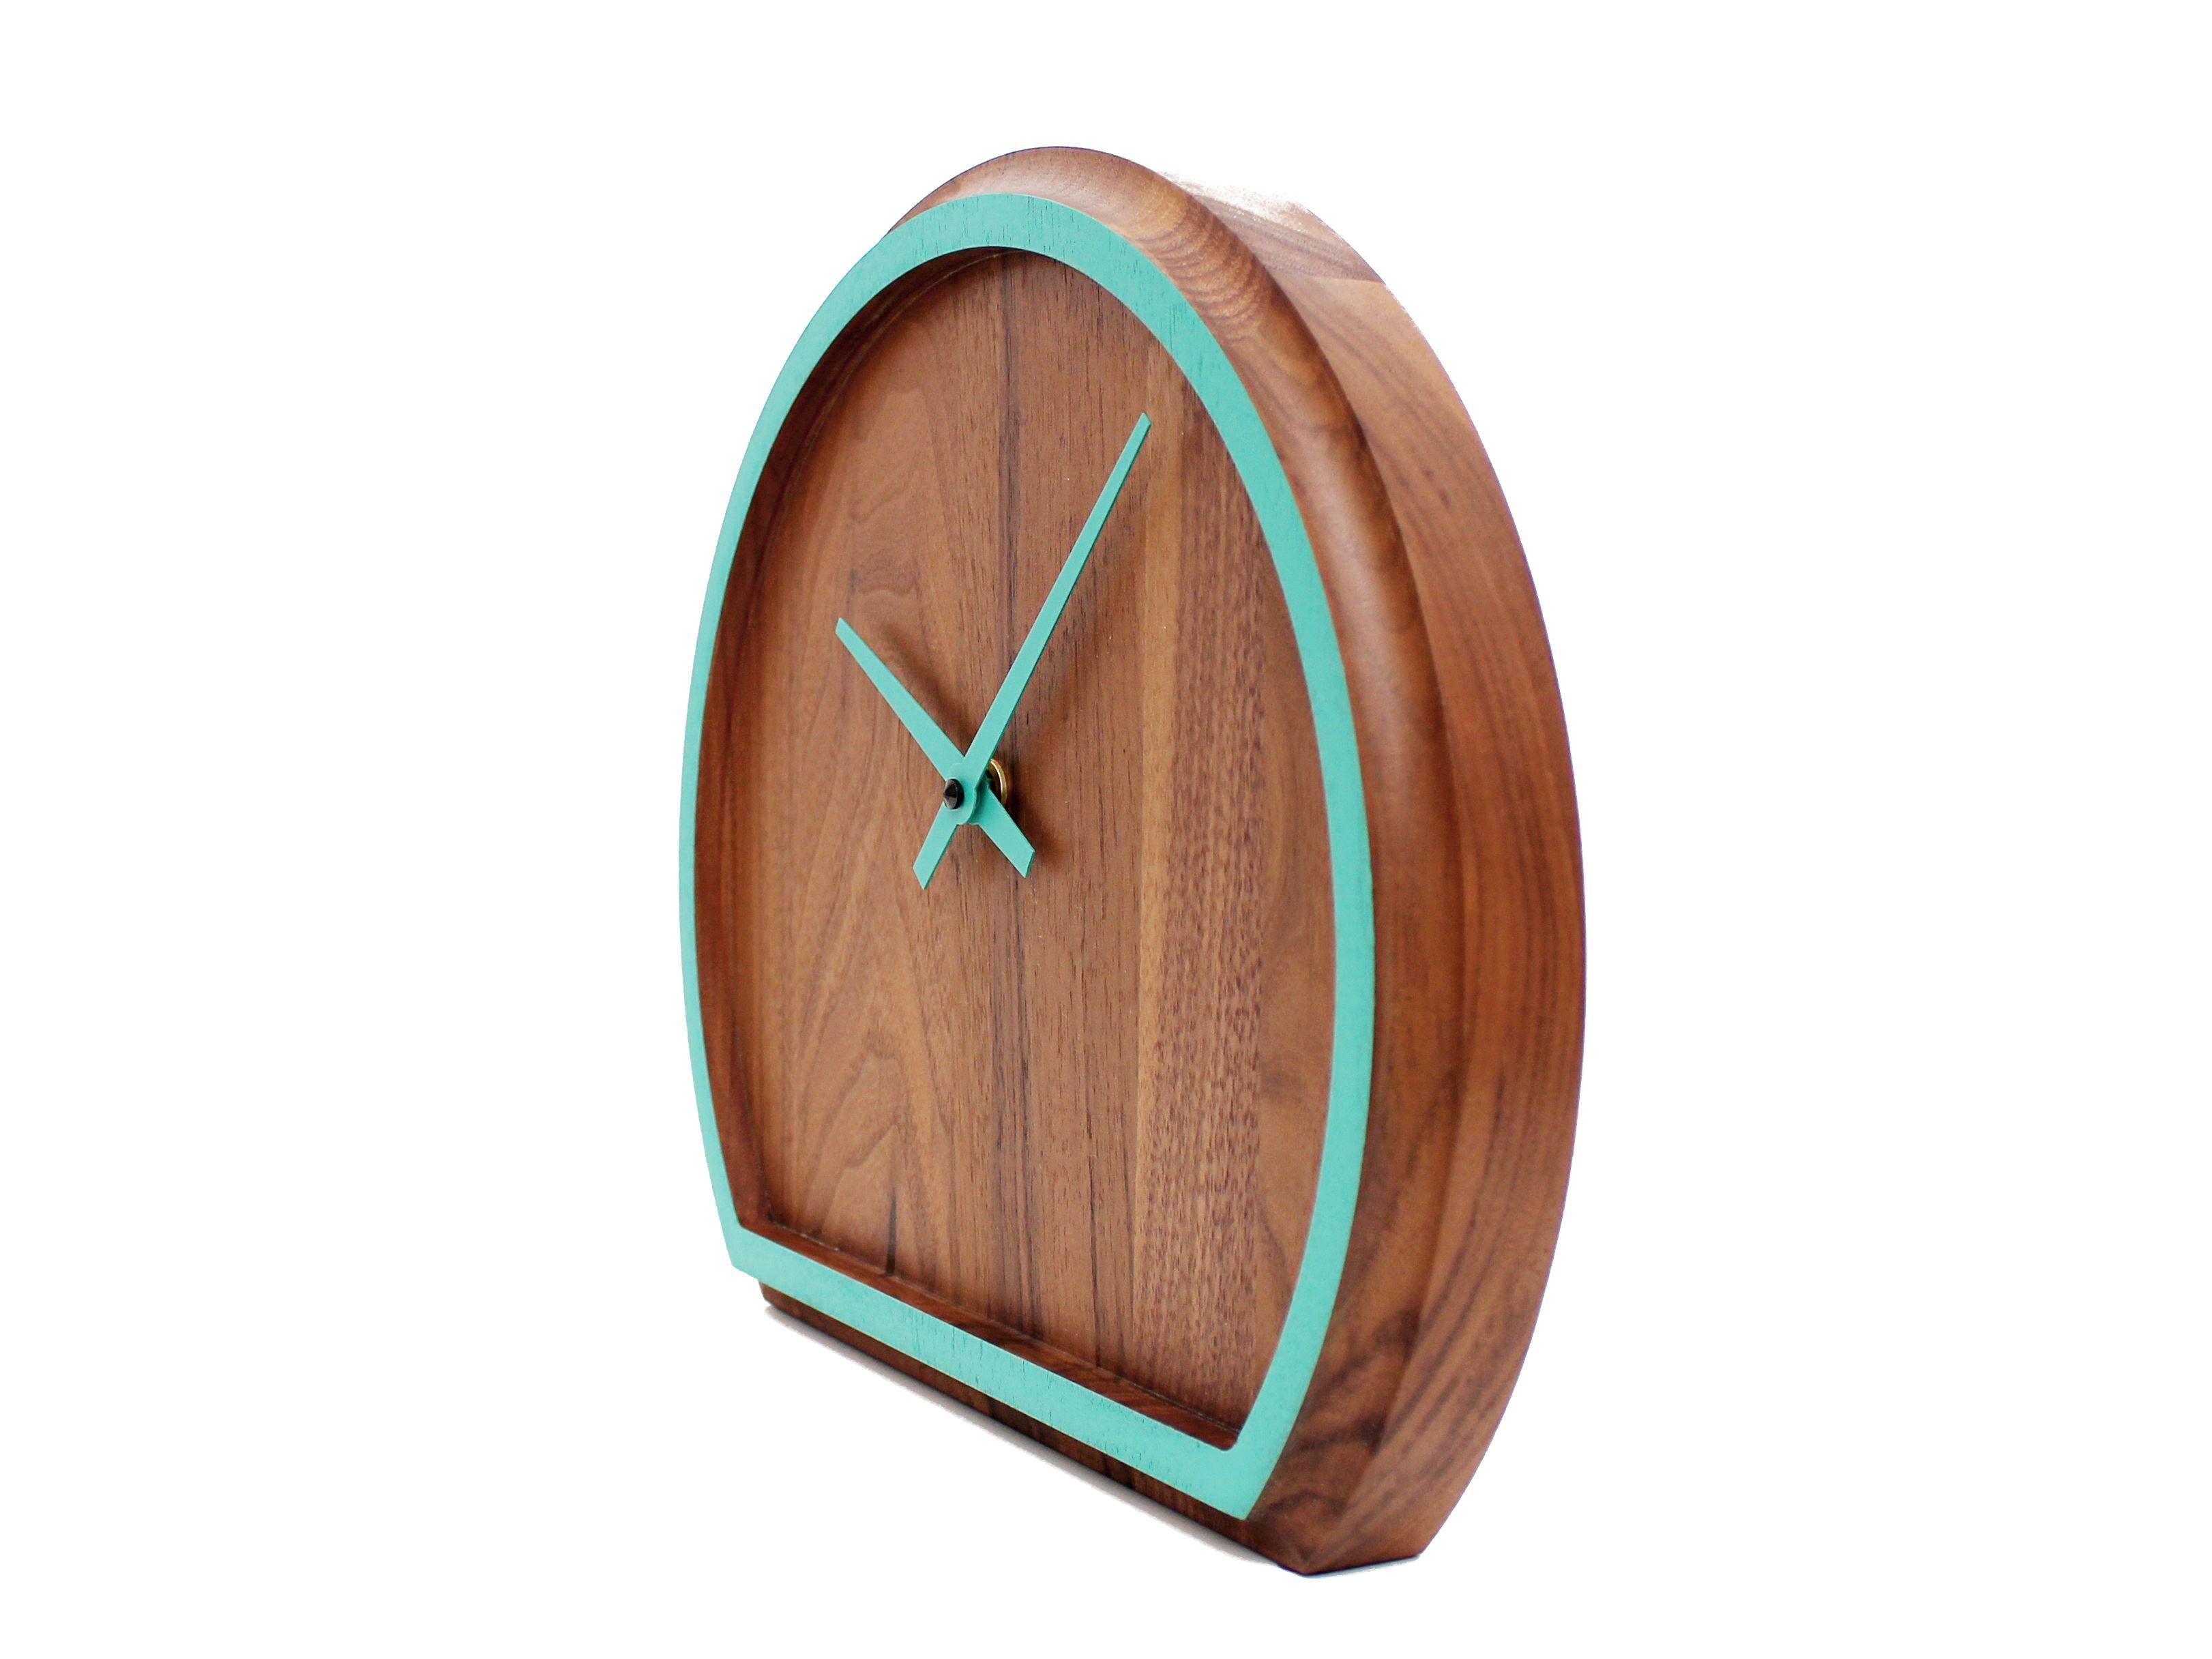 madera uhr aus walnussotono design